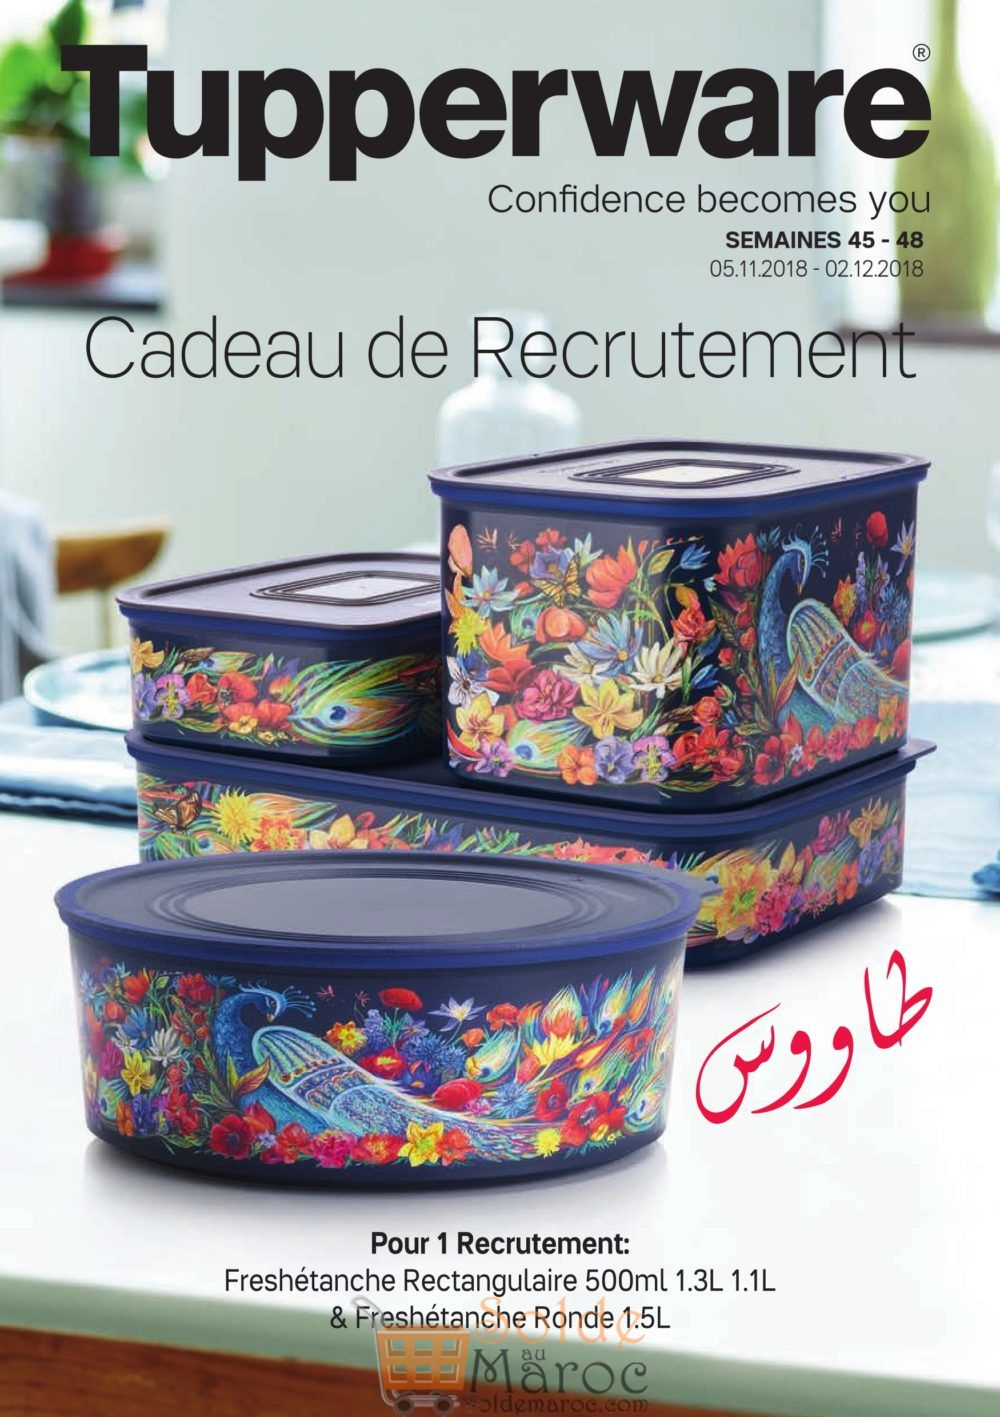 Catalogue Tupperware Maroc Cadeau de recrutement Jusqu'au 2 Décembre 2018